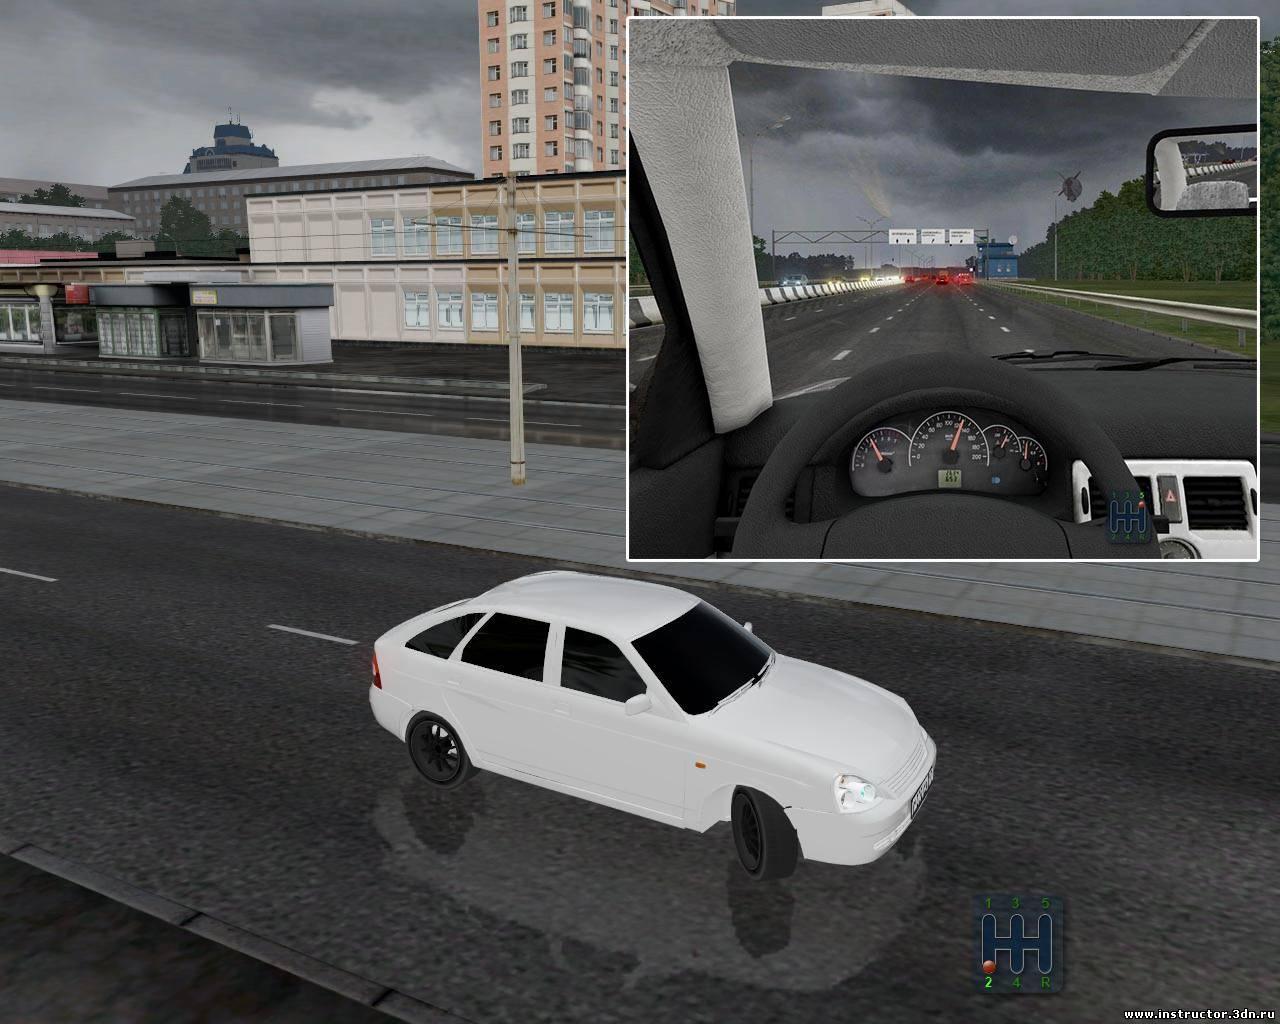 Toyota land cruiser 100 для 3d инструктор 2. 2. 7.